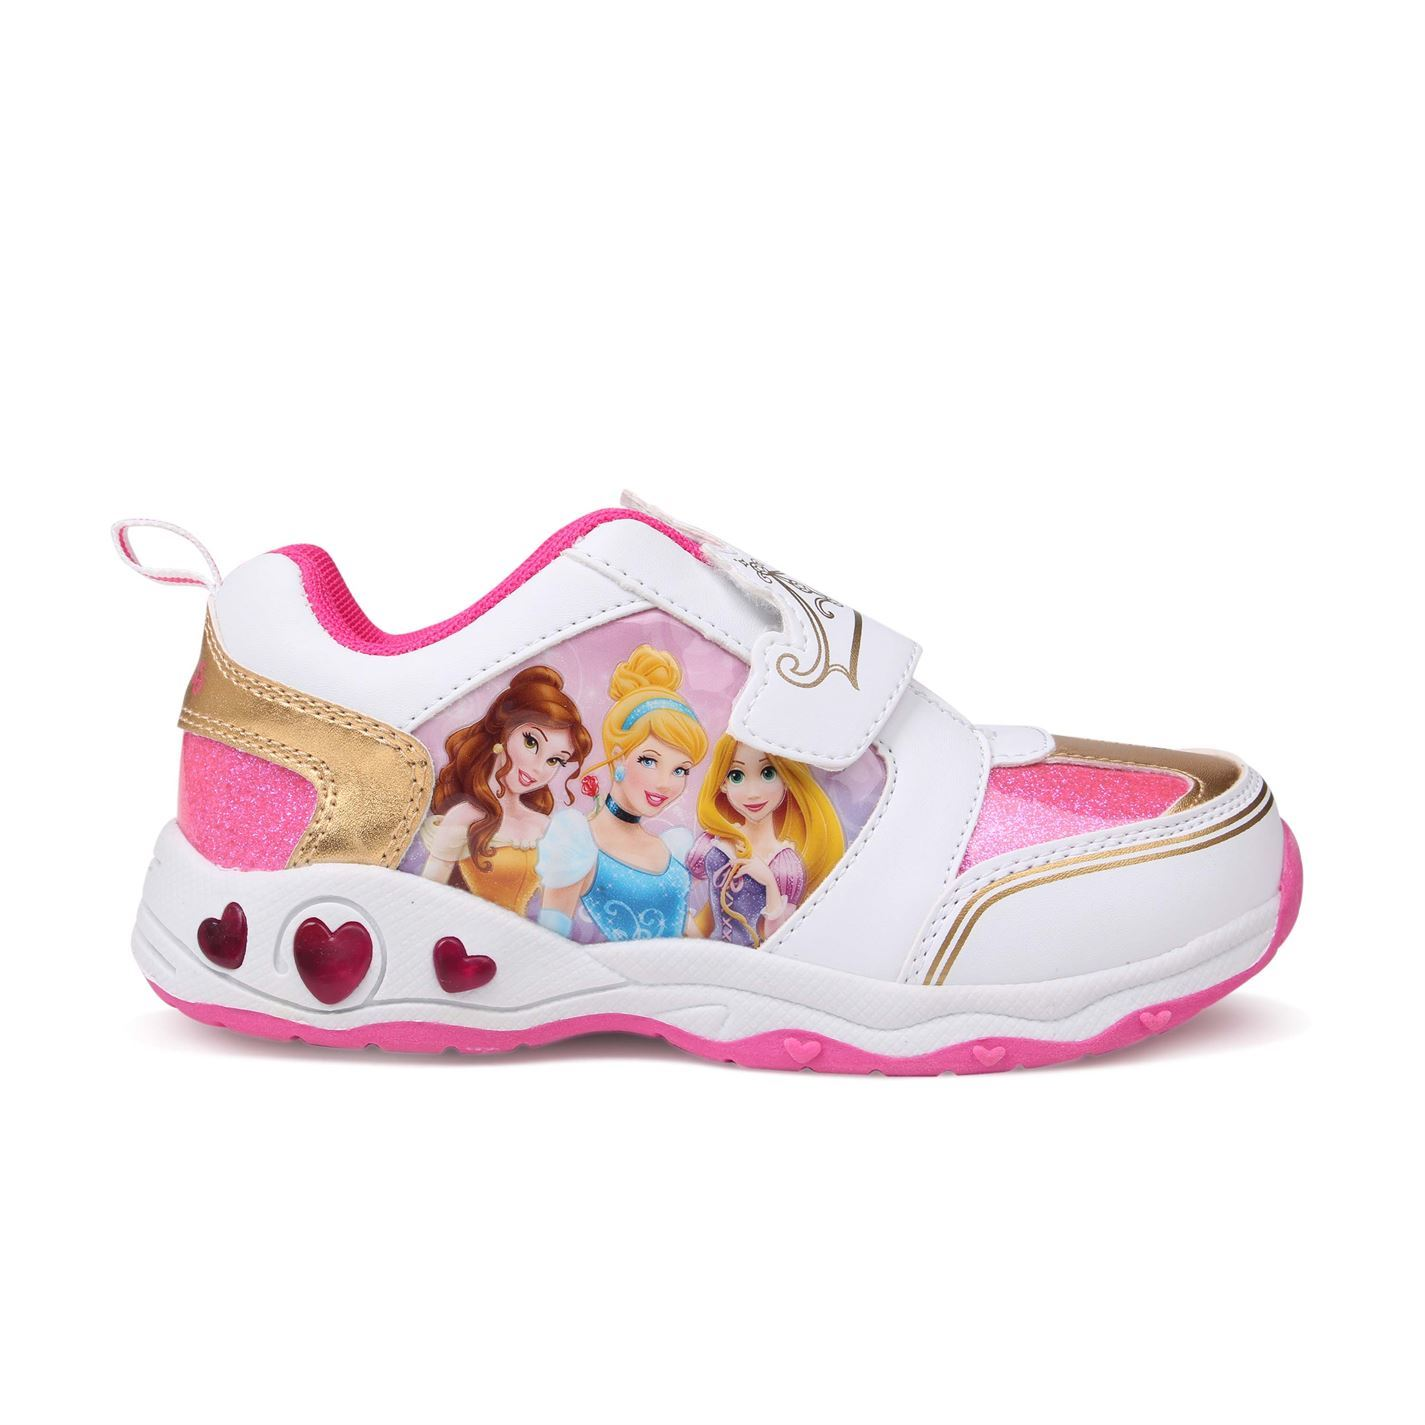 3d212da985 ... Disney Princess Light Up Trainers Infants Pink White Sneakers Shoes  Footwear ...